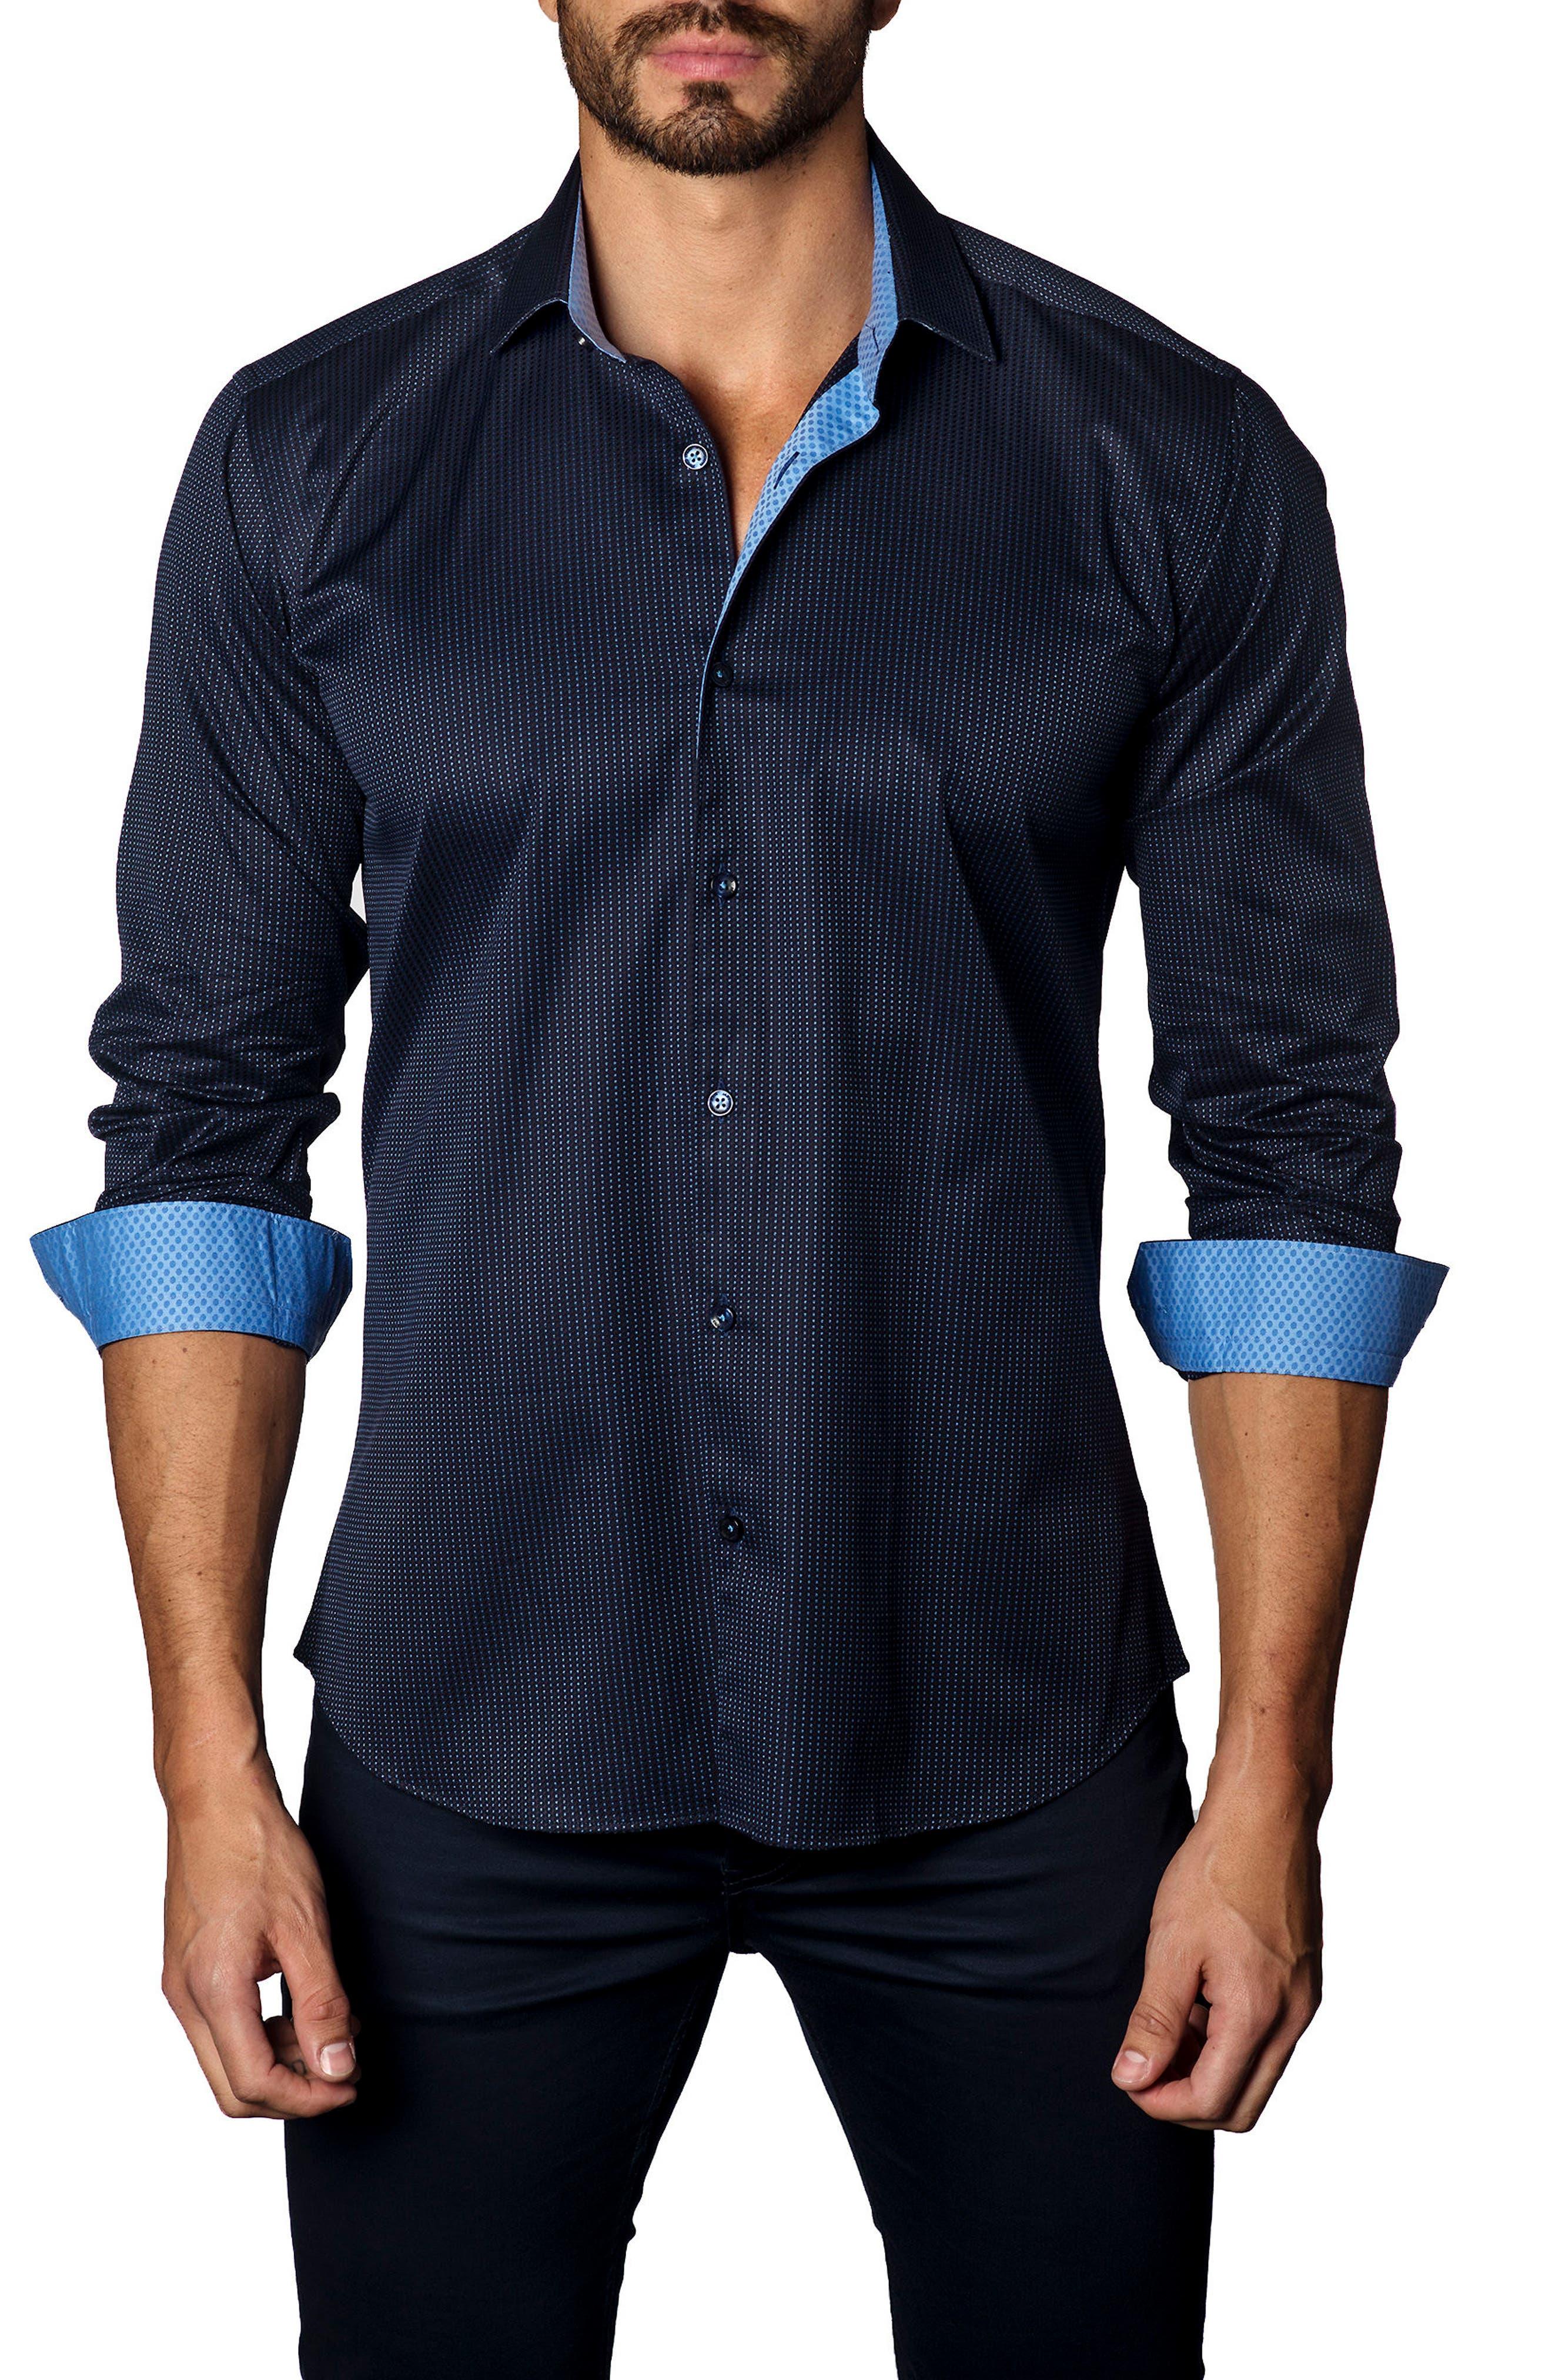 Main Image - Jared Lang Trim Fit Dot Jacquard Sport Shirt